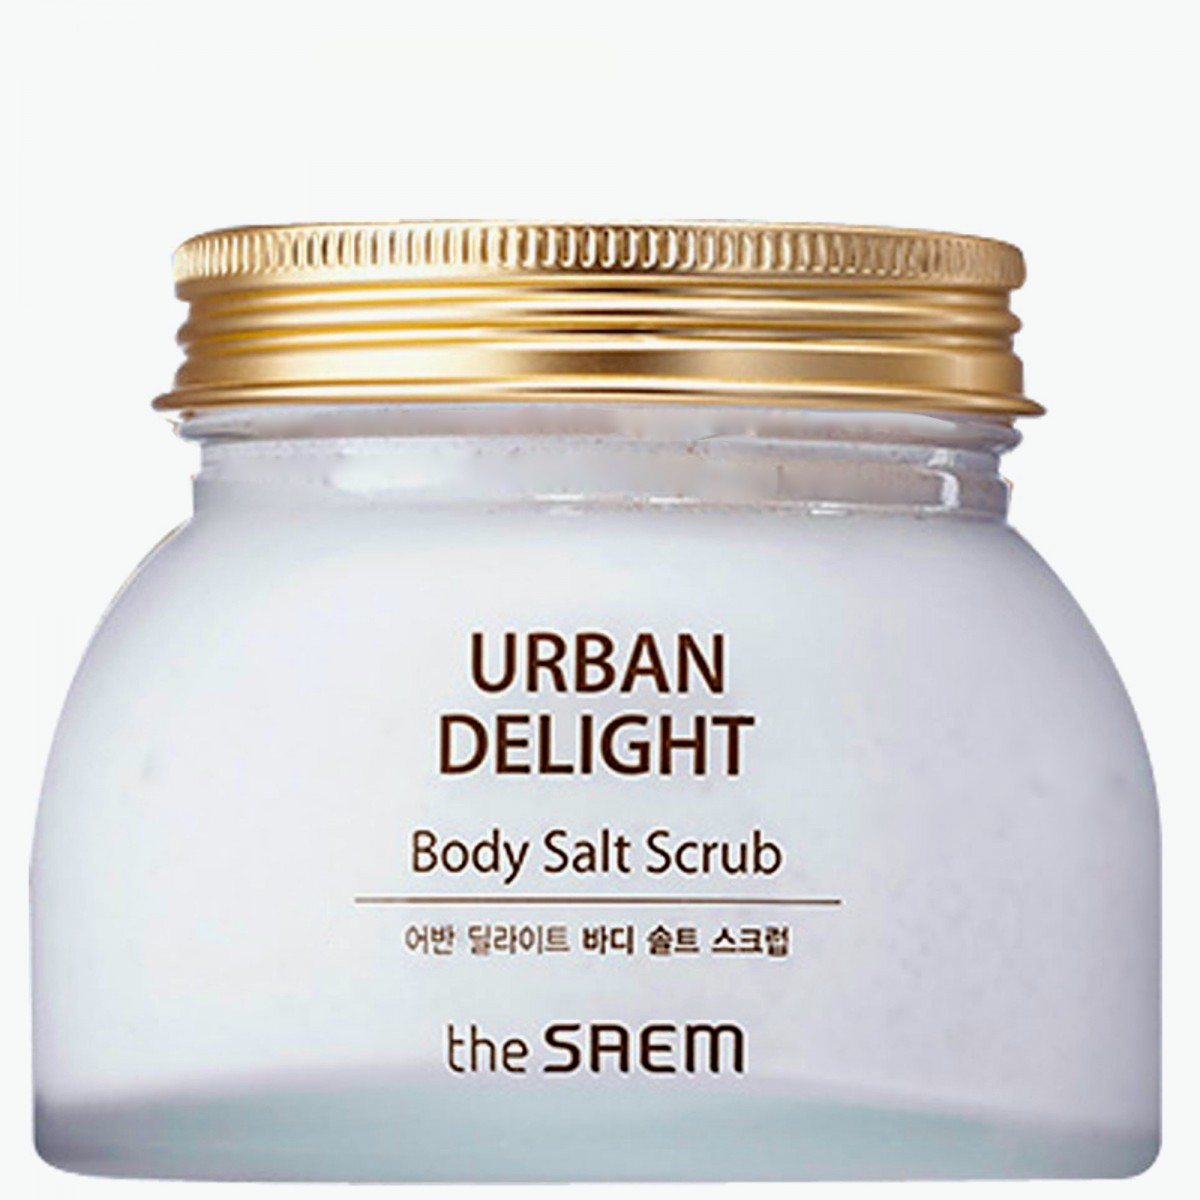 Скраб для тела с морской солью THE SAEM Urban Delight Body Salt Scrub - 280 г